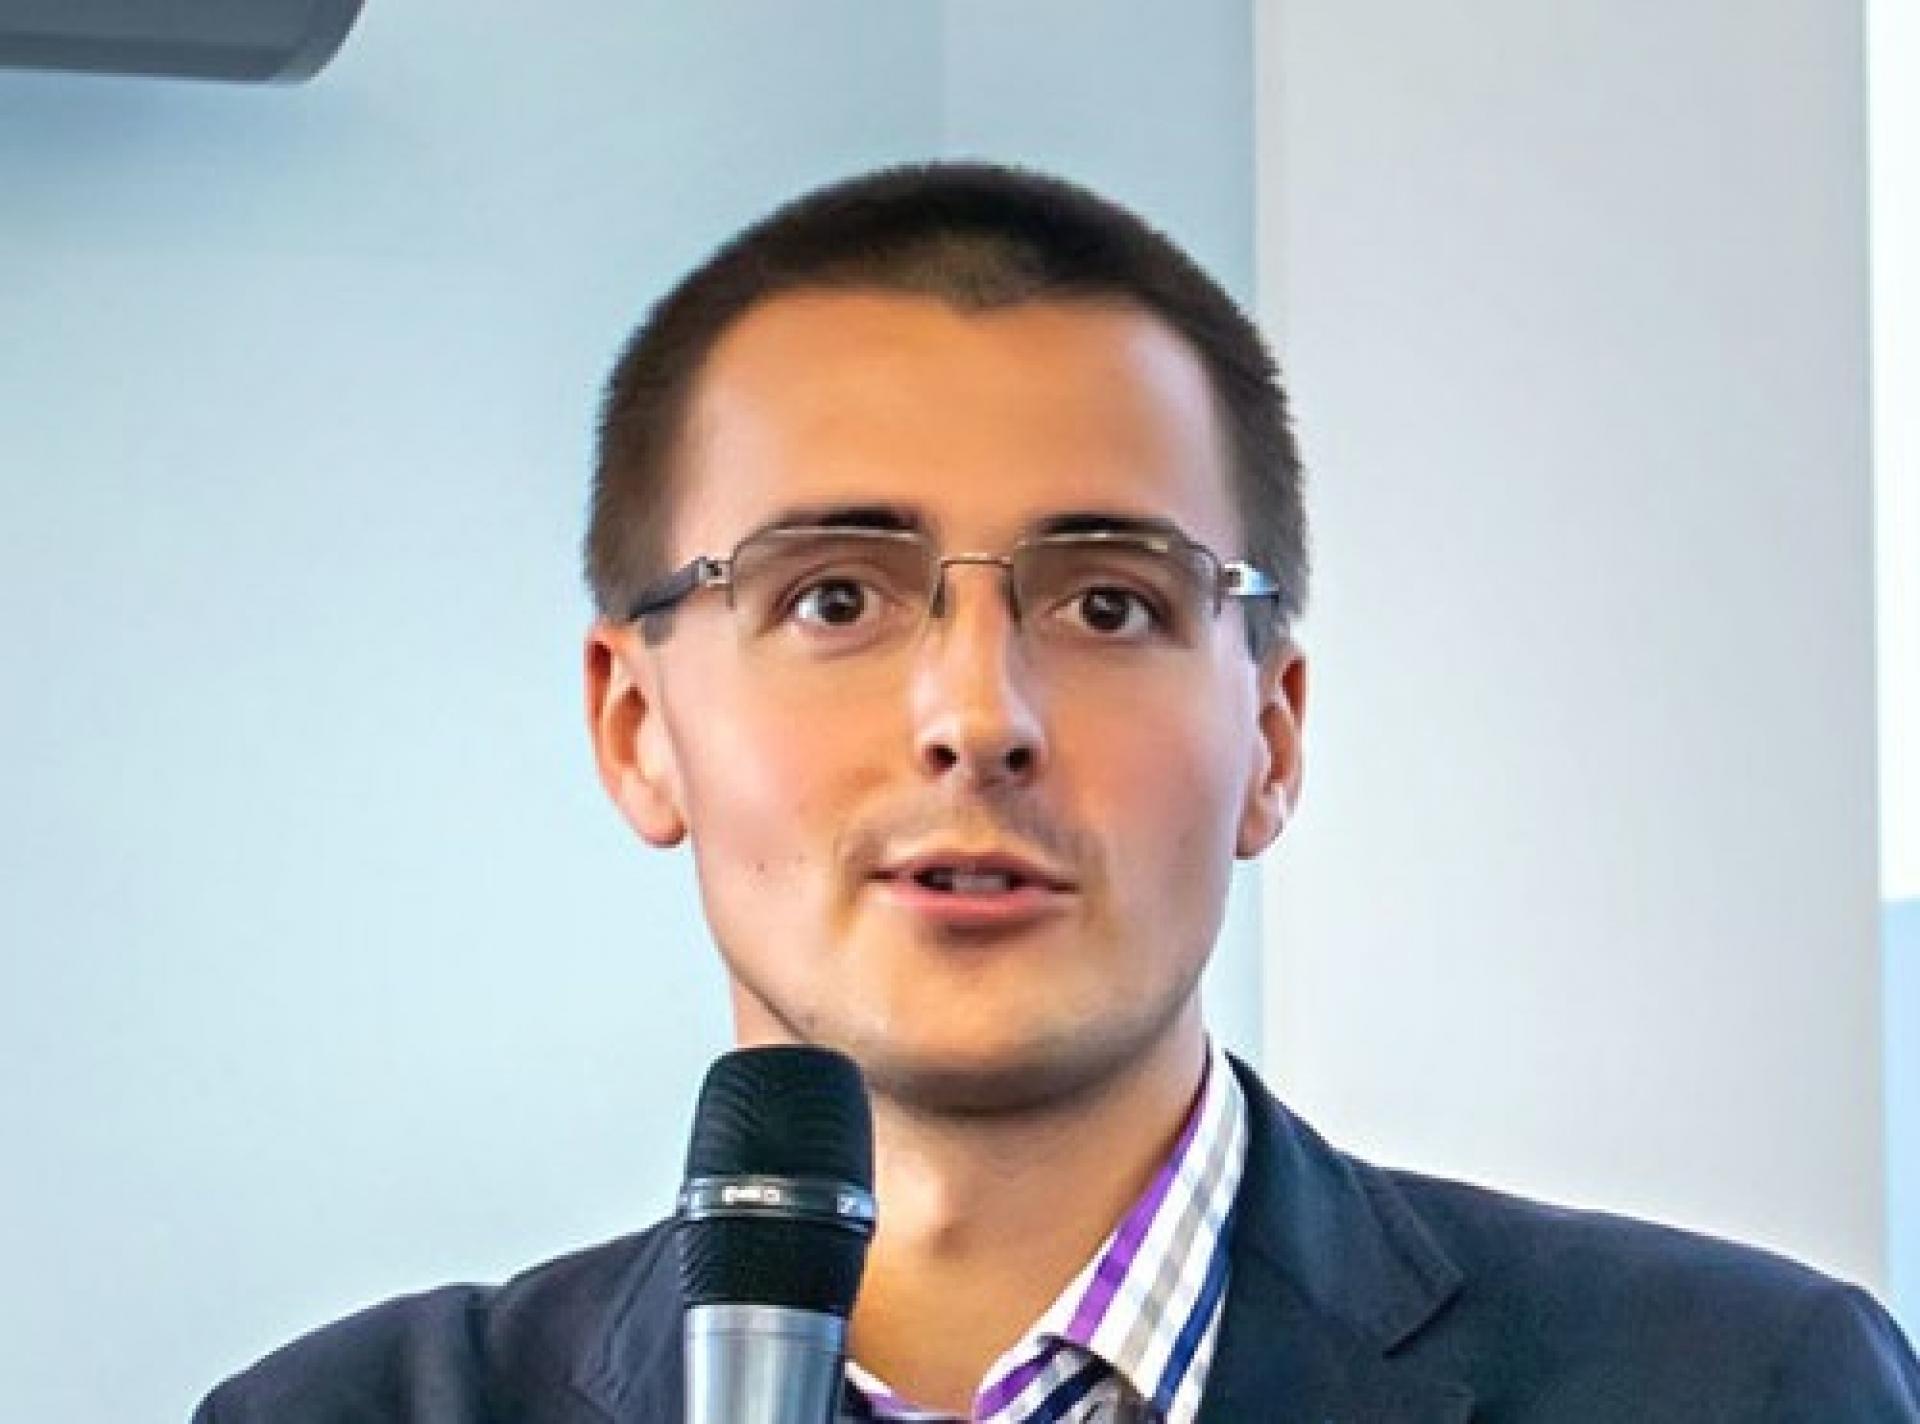 Tomas Hrozensky